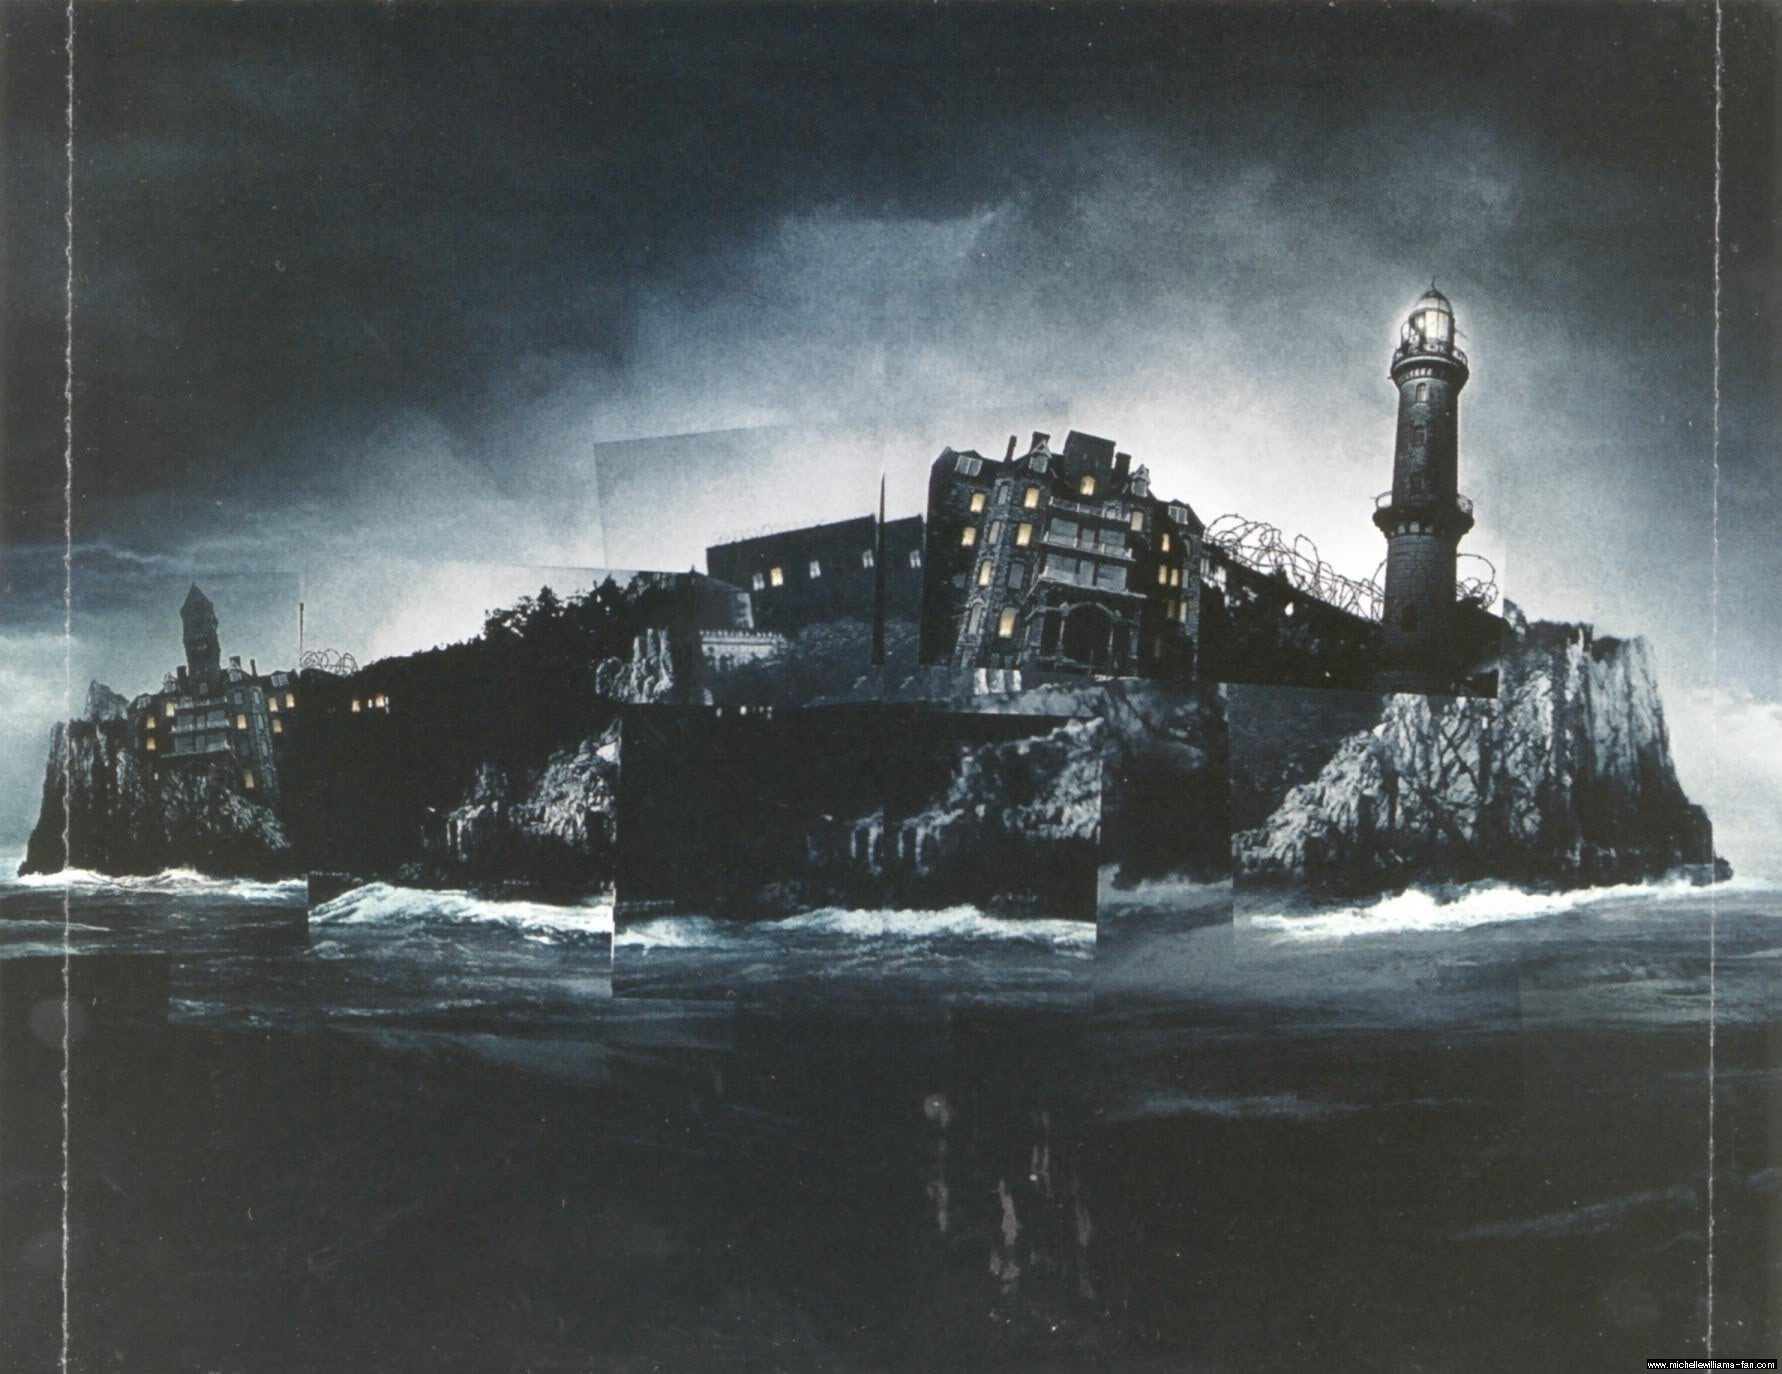 Shutter-Island-Soundtrack-jacket-shutter-island-11512366-1782-1374